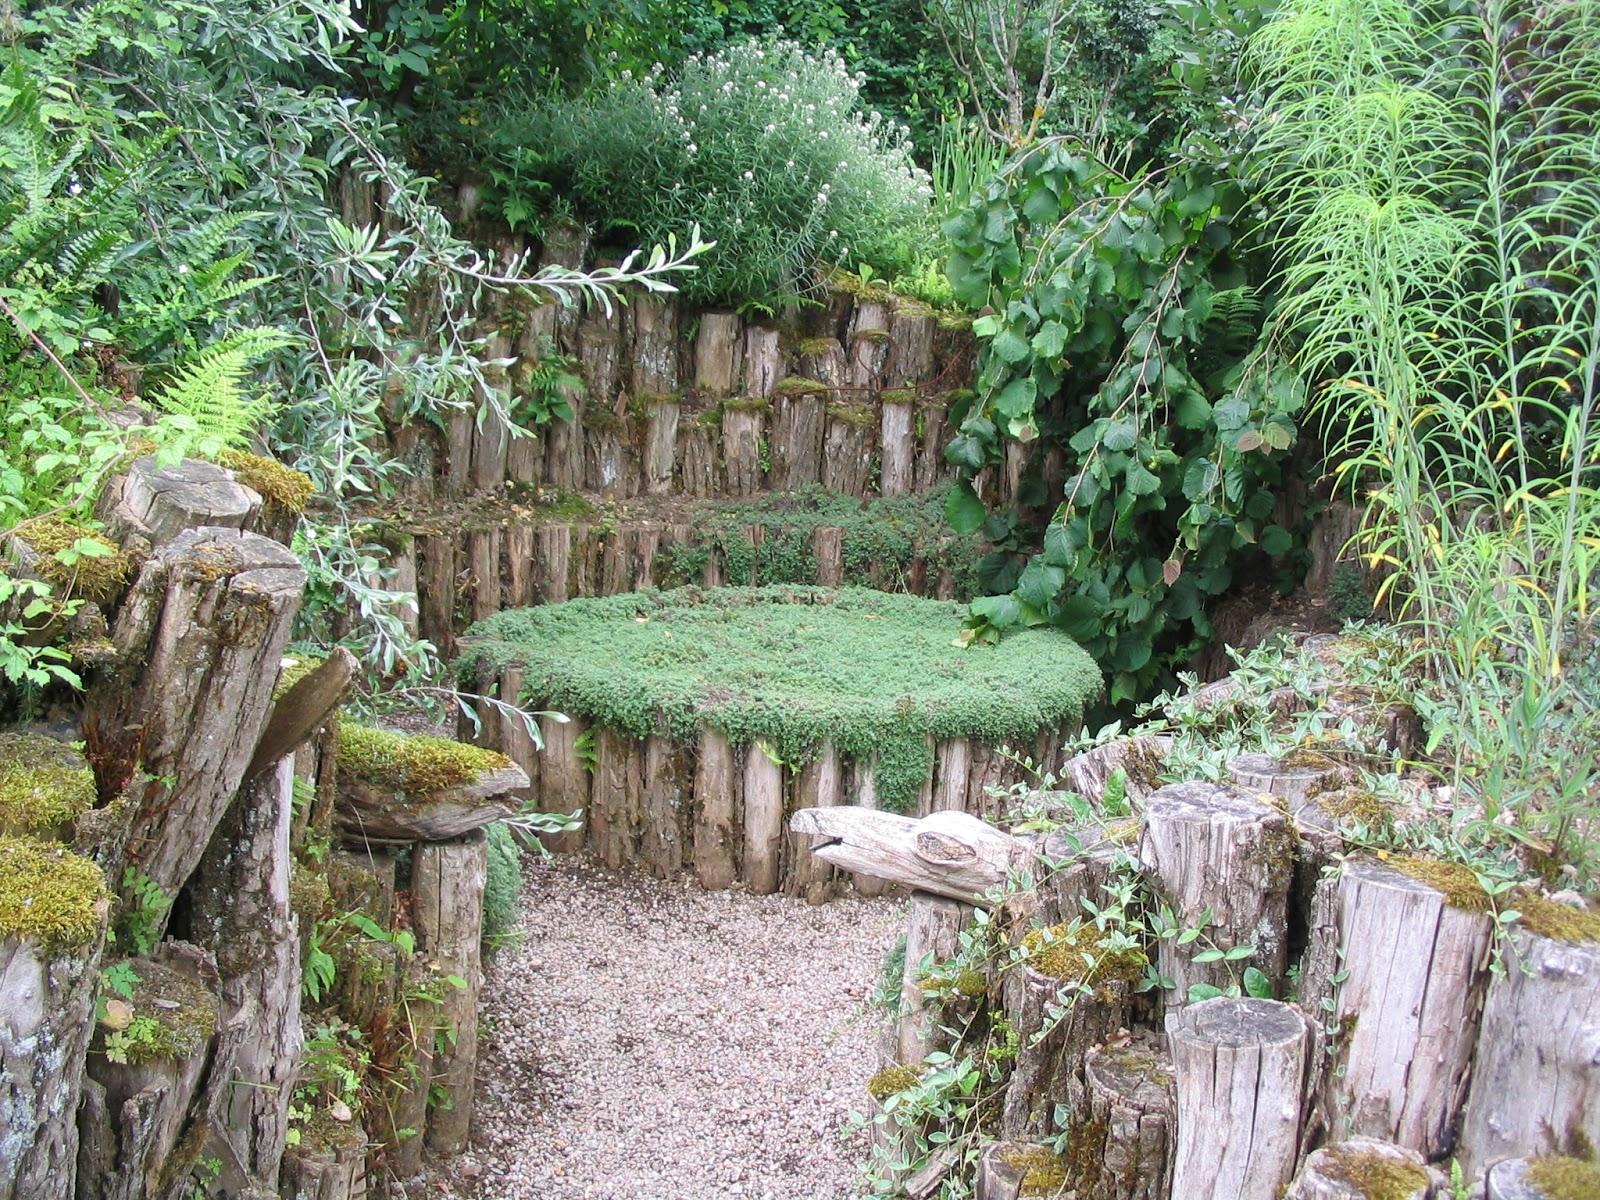 Le jardin de brigitte alsace berchigrange - Les jardins d alsace ...